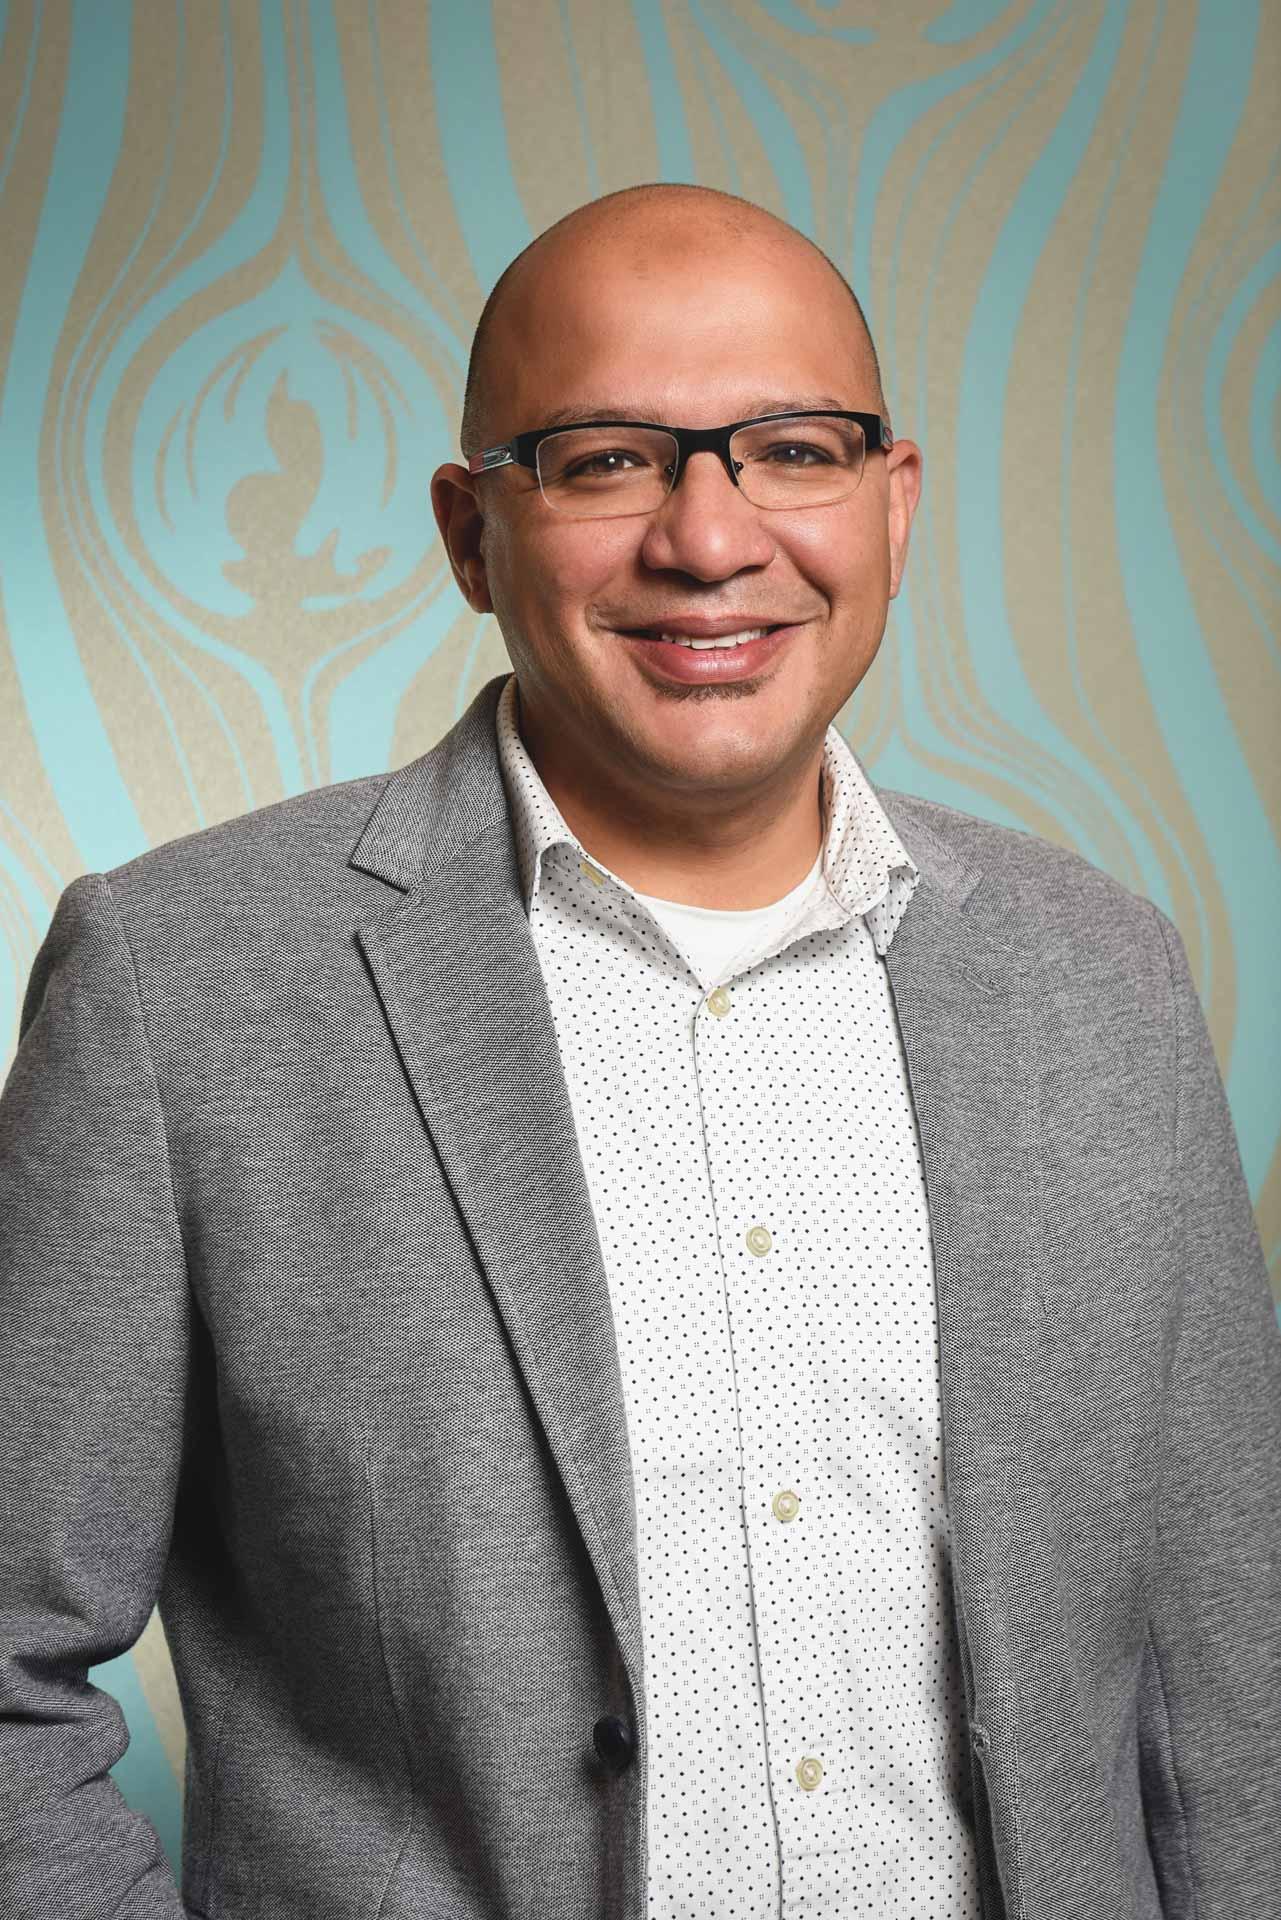 Dr. Mohamed El Gamal   Toothville Family Dentistry   NW Calgary   General Dentist